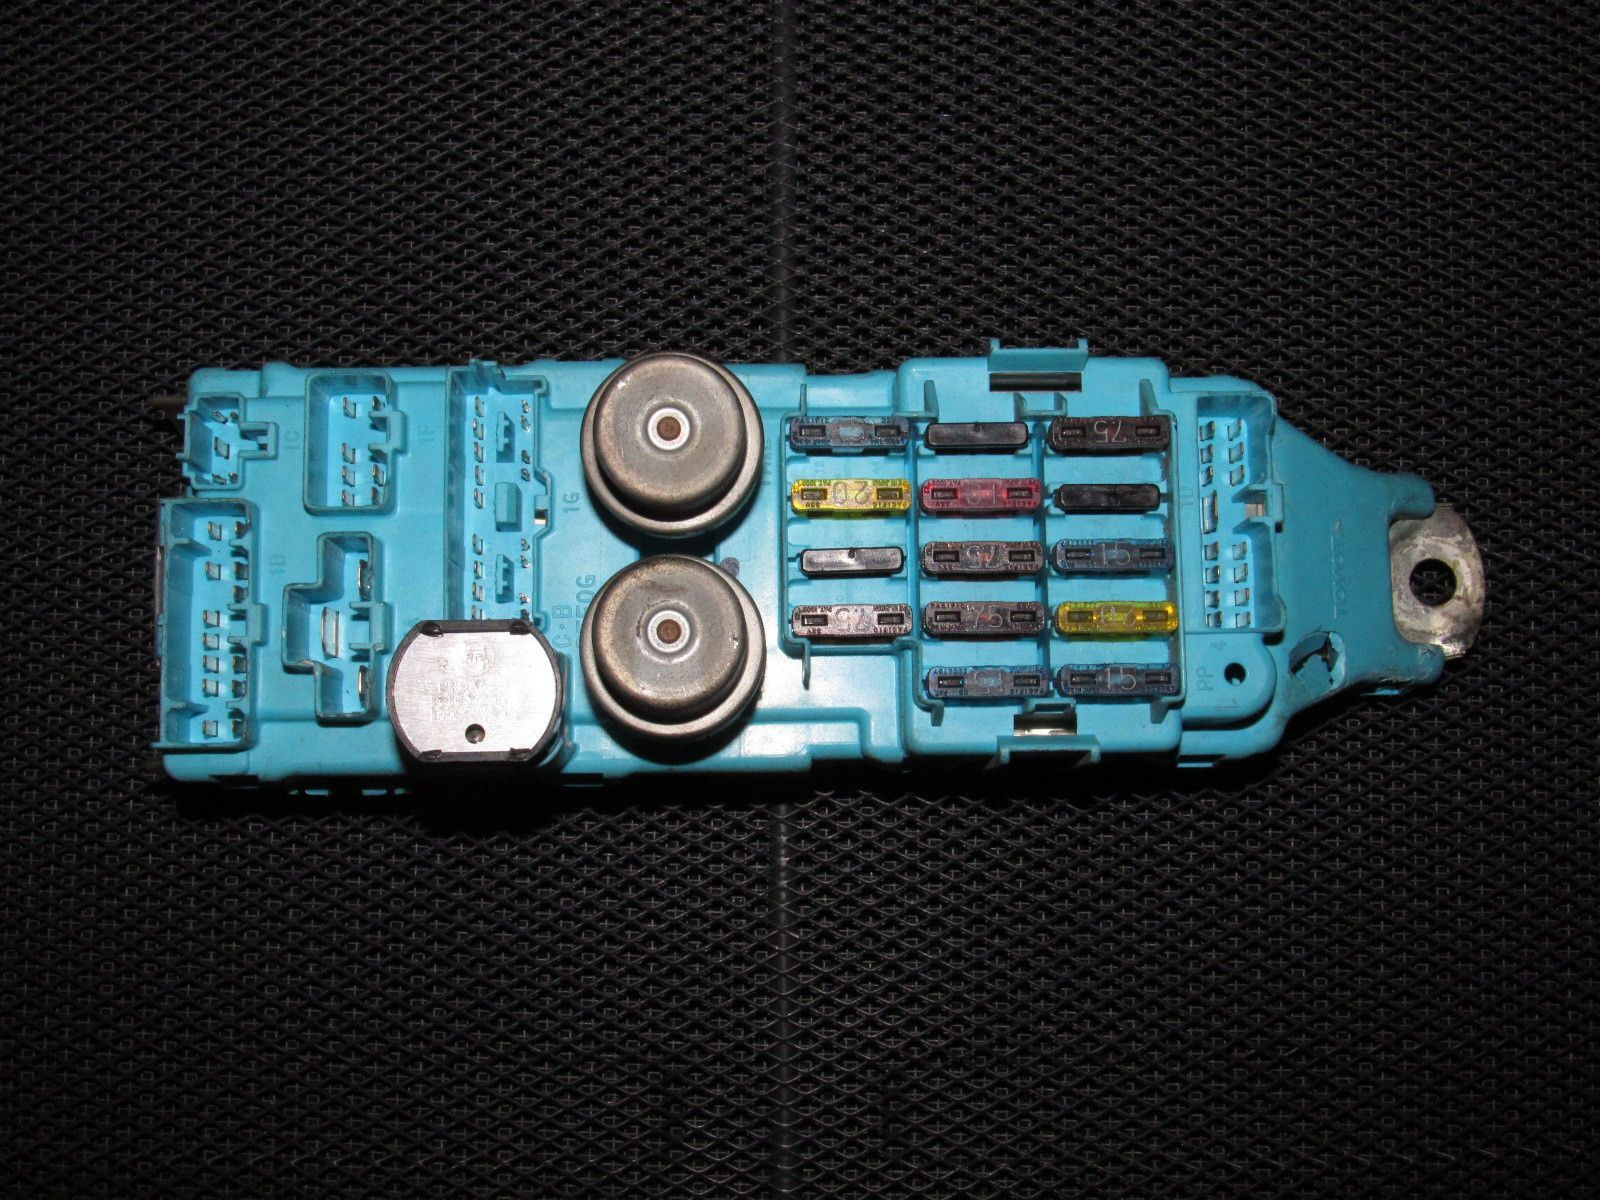 medium resolution of 86 87 88 toyota supra oem turbo interior fuse box autopartone com rh pinterest com 88